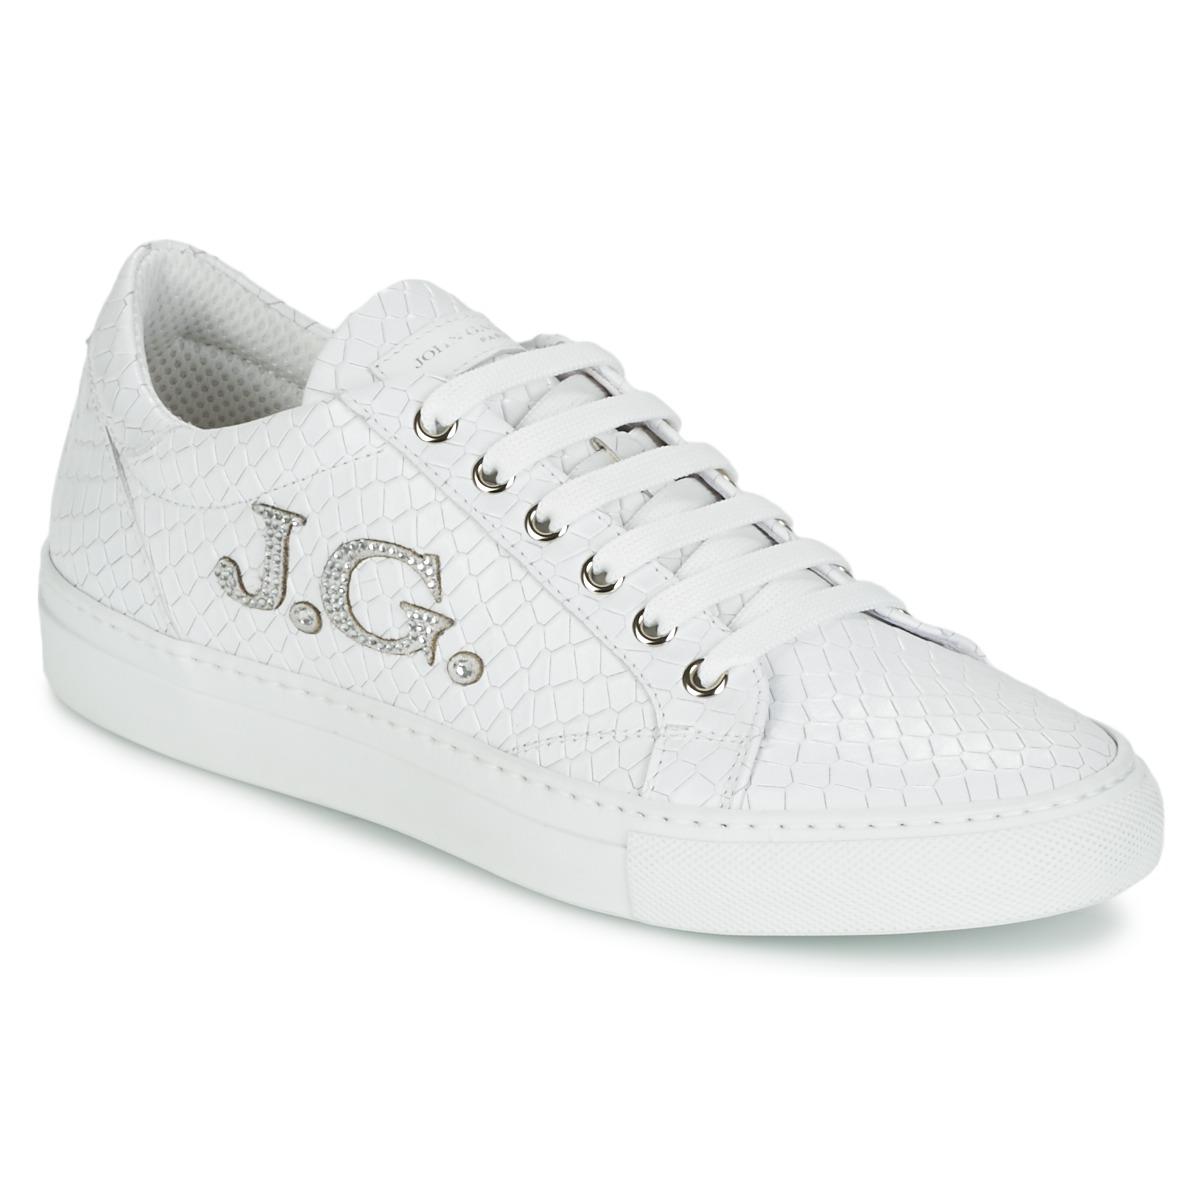 John Galliano 7977 Blanc